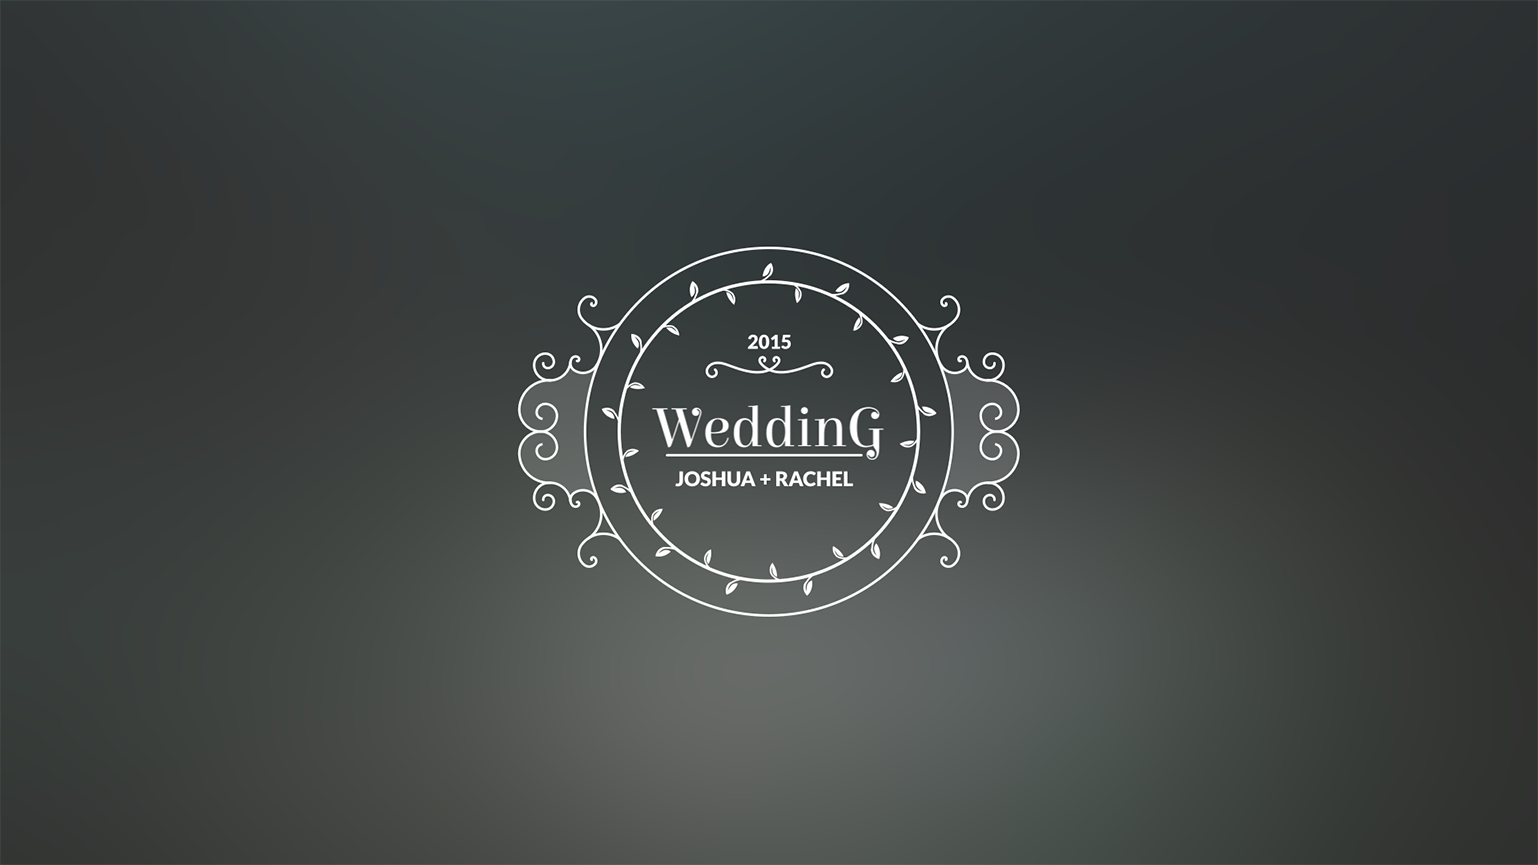 100 Luxury Wedding Titles In 2020 Wedding Titles Luxury Wedding Wedding